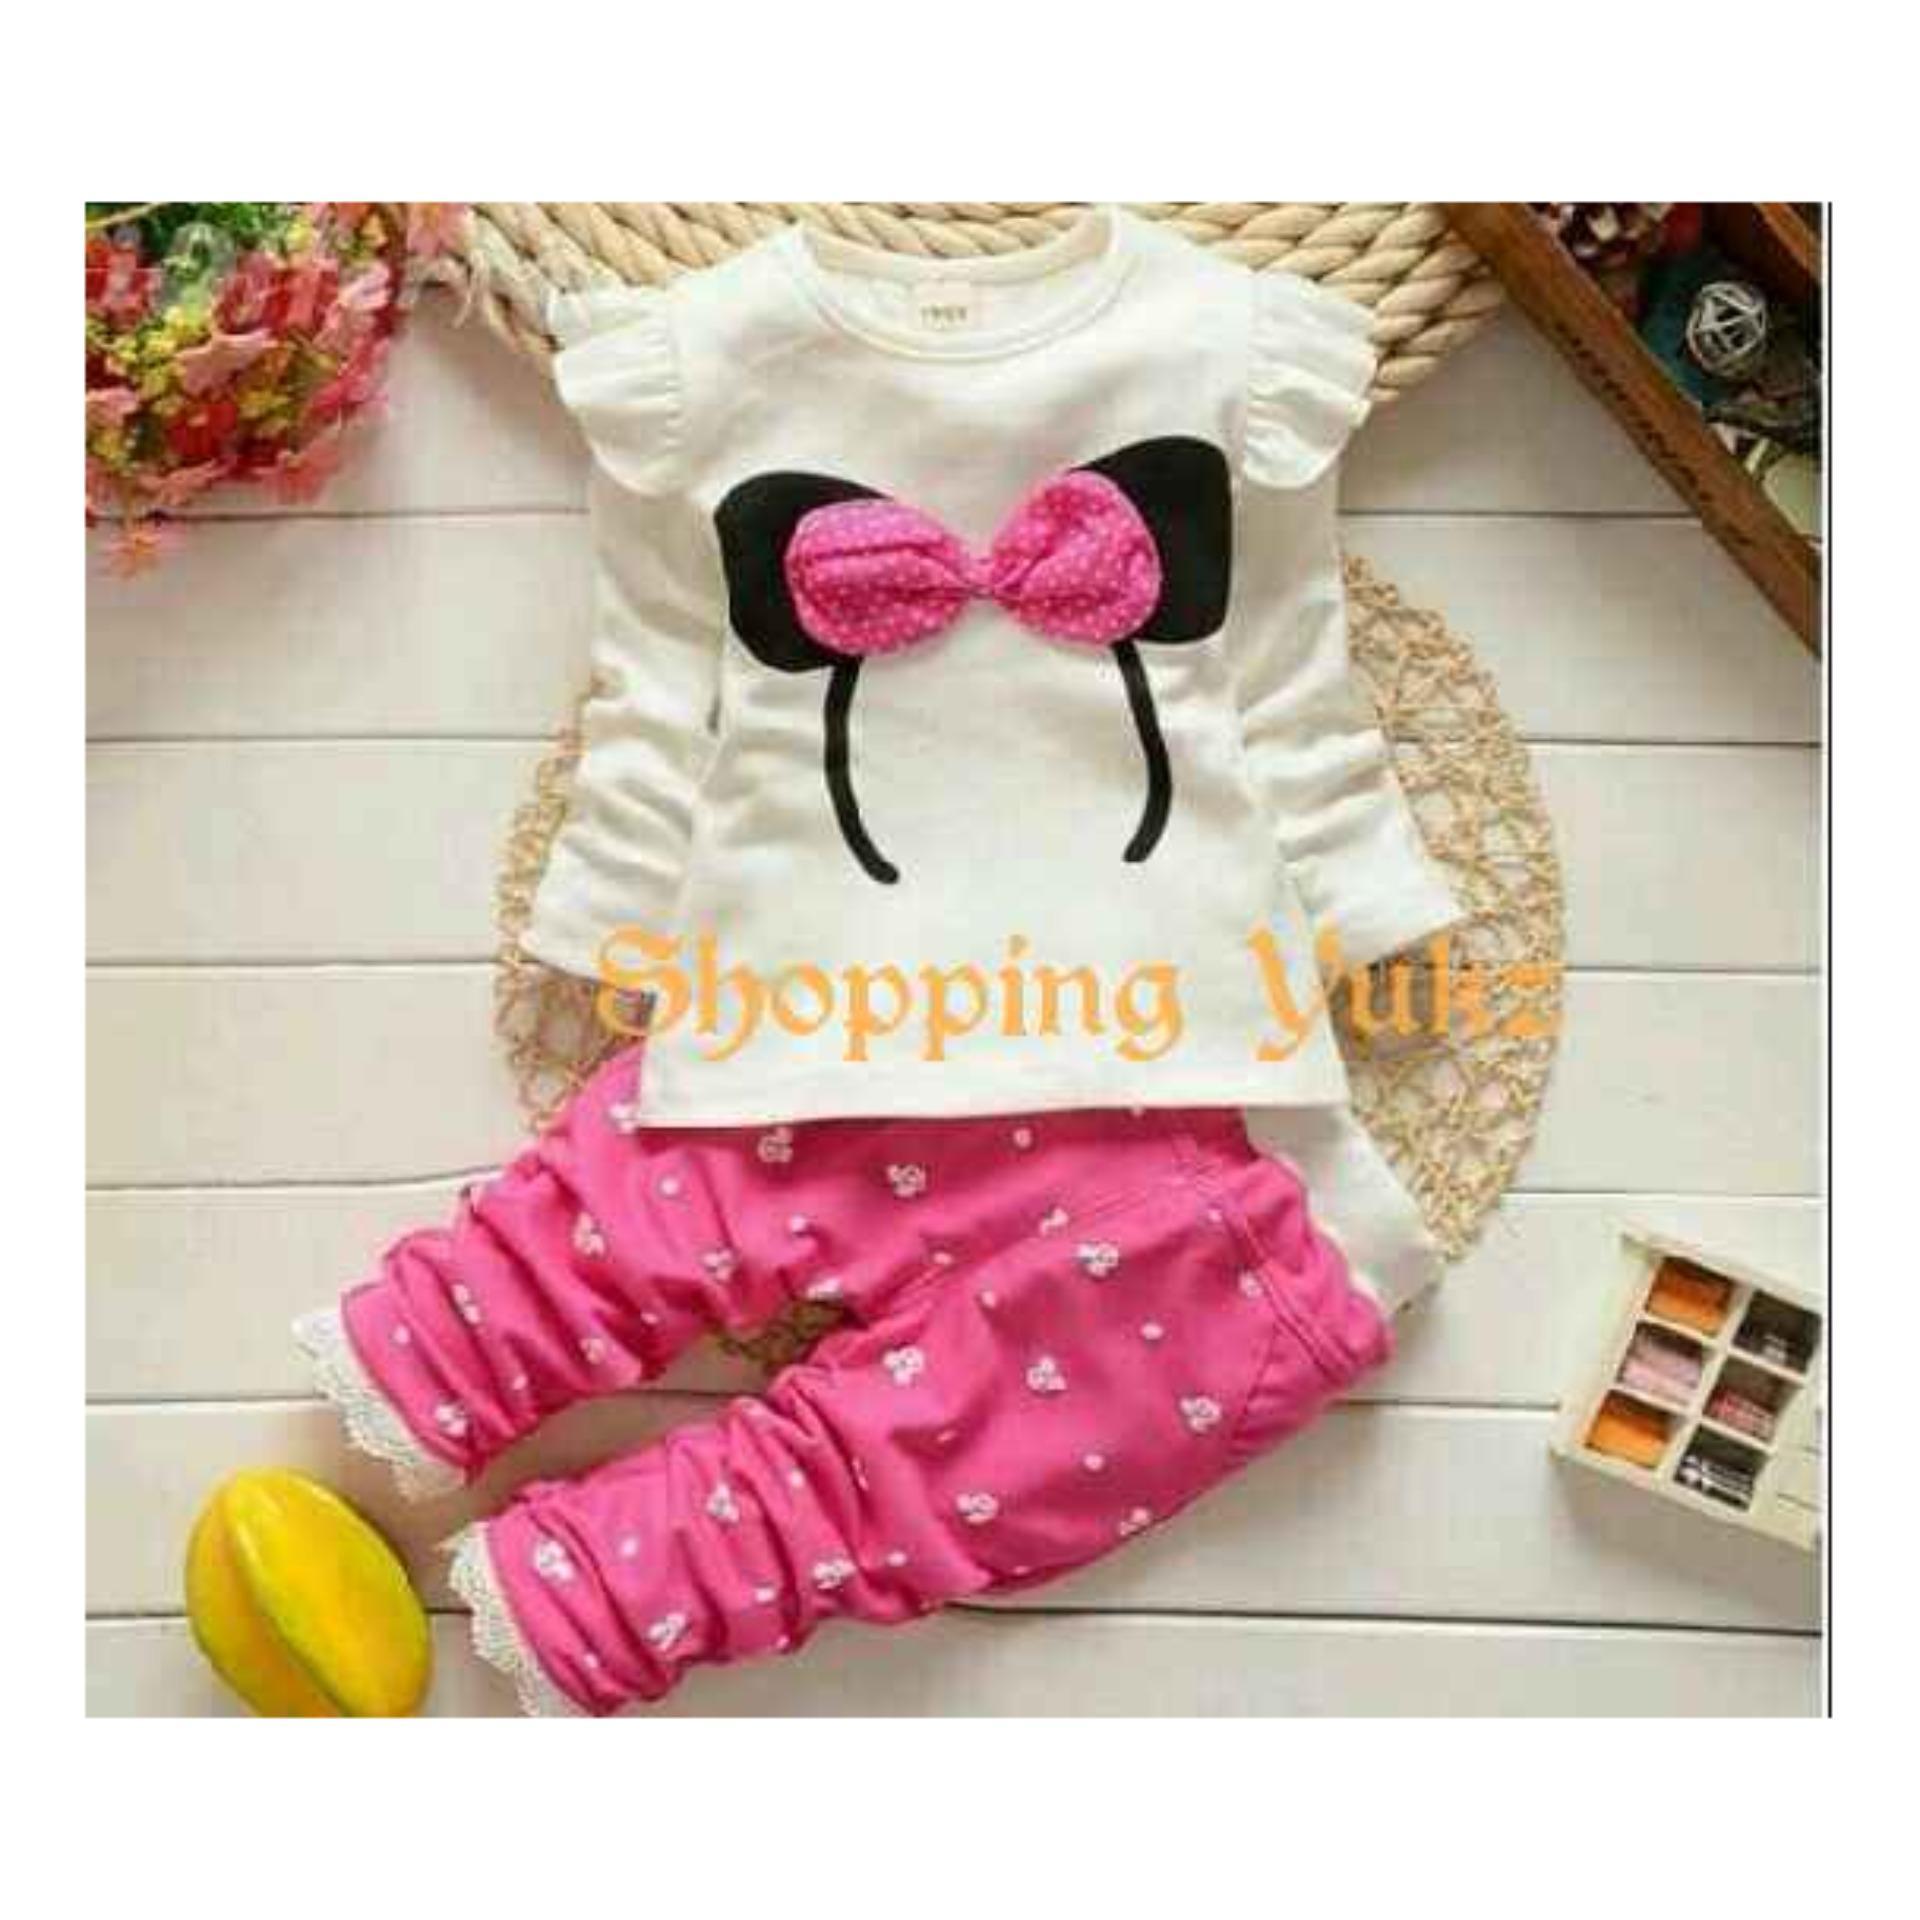 Harga Promo Dress Anak Sabrina Scuba Import Toko Online Laris Baju Setelan Flower Perempuan Shopping Yukz Atasan Dan Celana Cewek Bandana